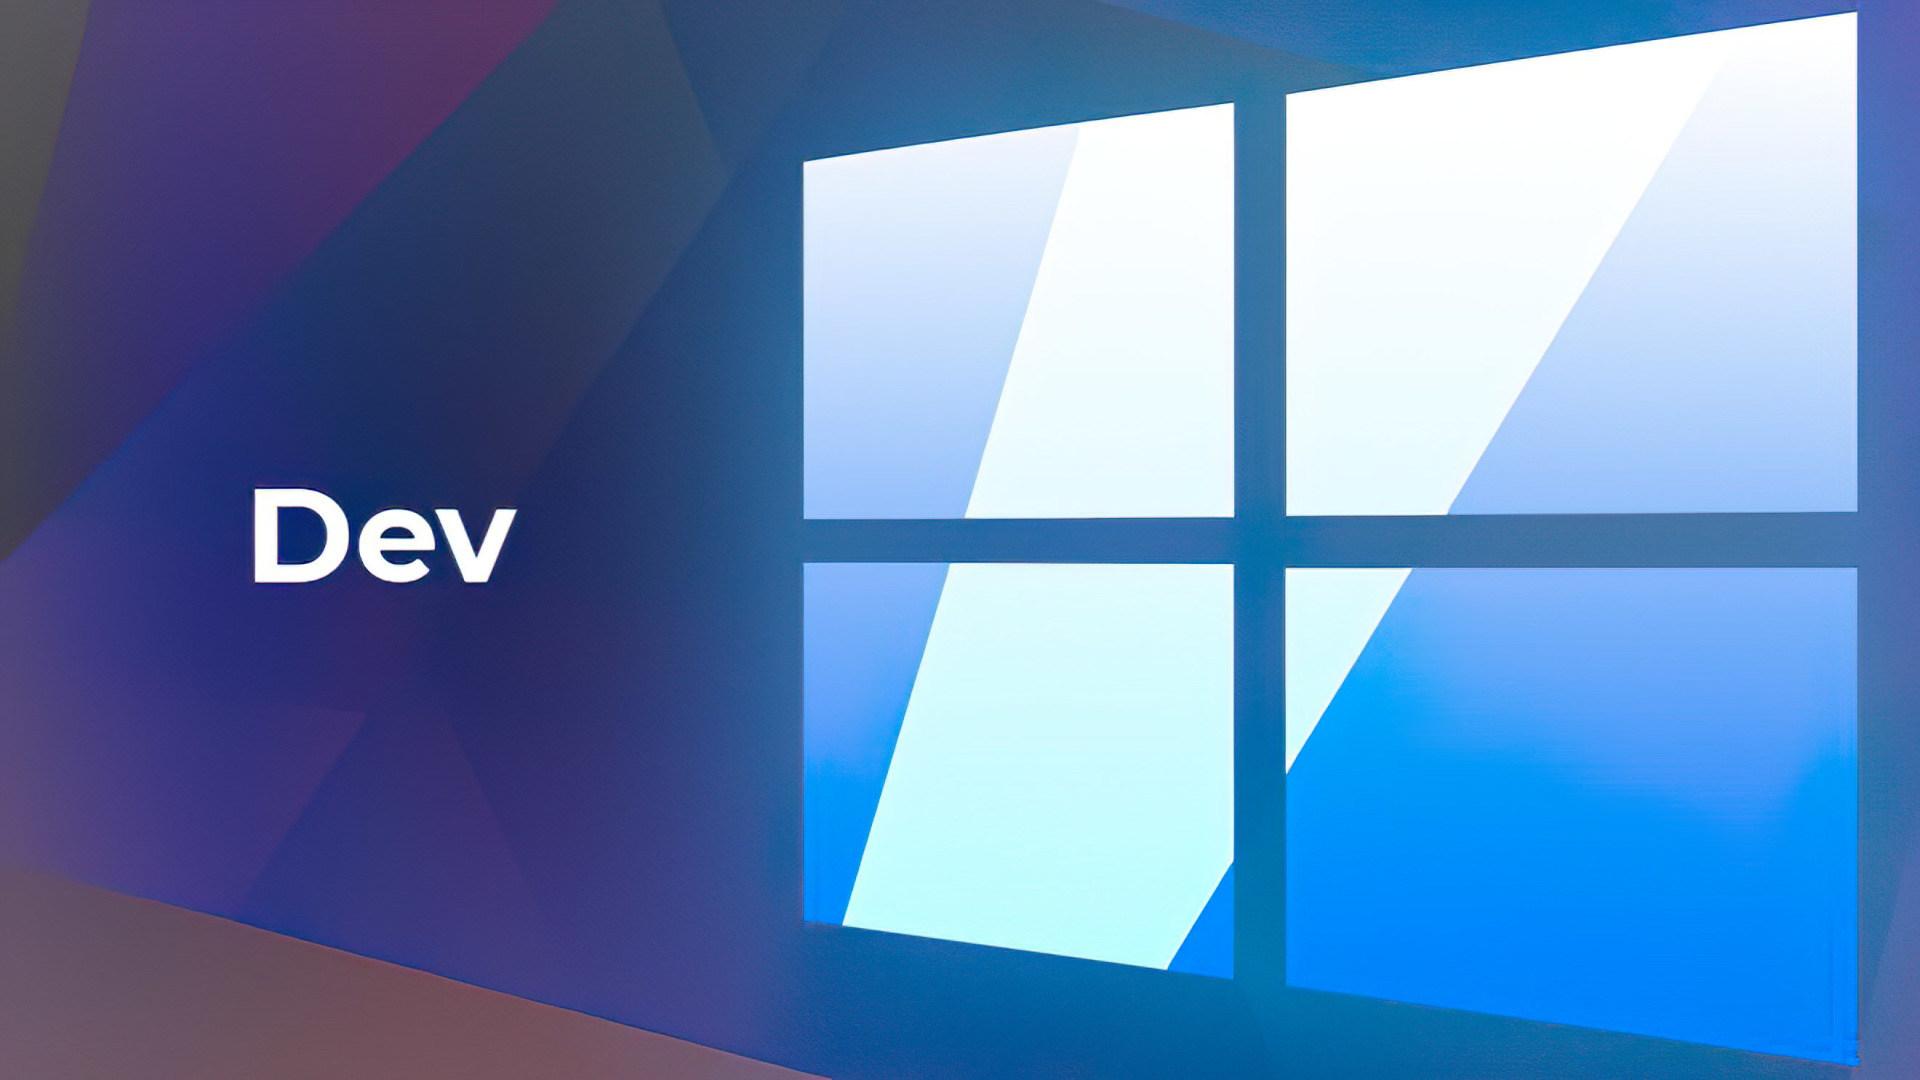 Microsoft, Windows 10, Beta, Windows Insider, Insider Preview, Windows 10 Insider Preview, Insider, Windows 10 Preview, Windows Insider Program, Windows Insider Preview, Windows Logo, Developer Preview, Development, Dev, Insider Program, Windows 10 Beta, Windows 10 Logo, Windows Beta, Windows 10 Dev, Insider Channel, Windows Insider Channel, dev channel, Windows Insider Dev Channel, Insider Dev Channel